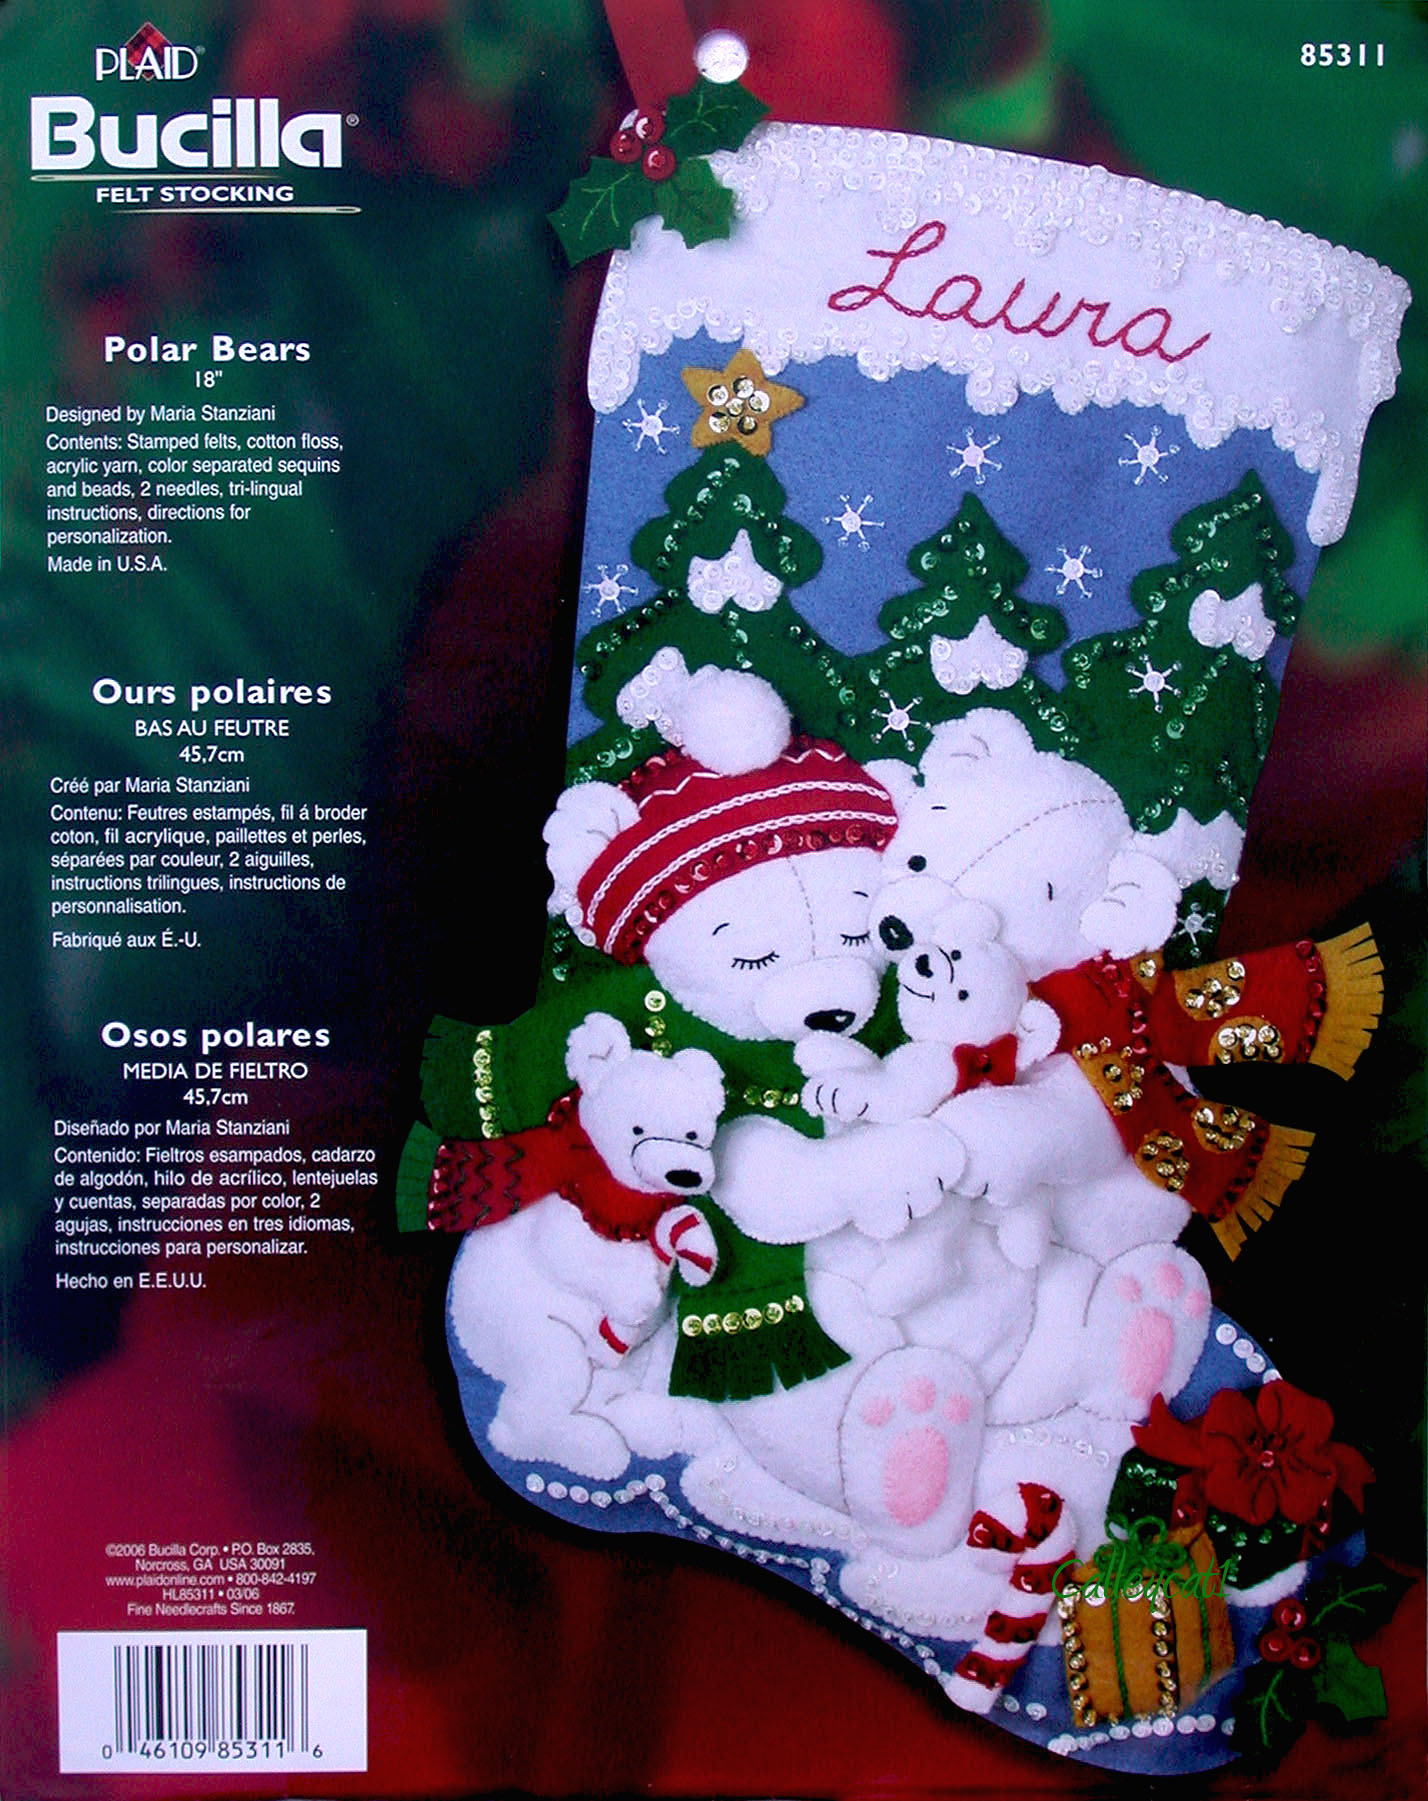 Bear Christmas Stocking.Polar Bears 18 Bucilla Felt Christmas Stocking Kit 85311